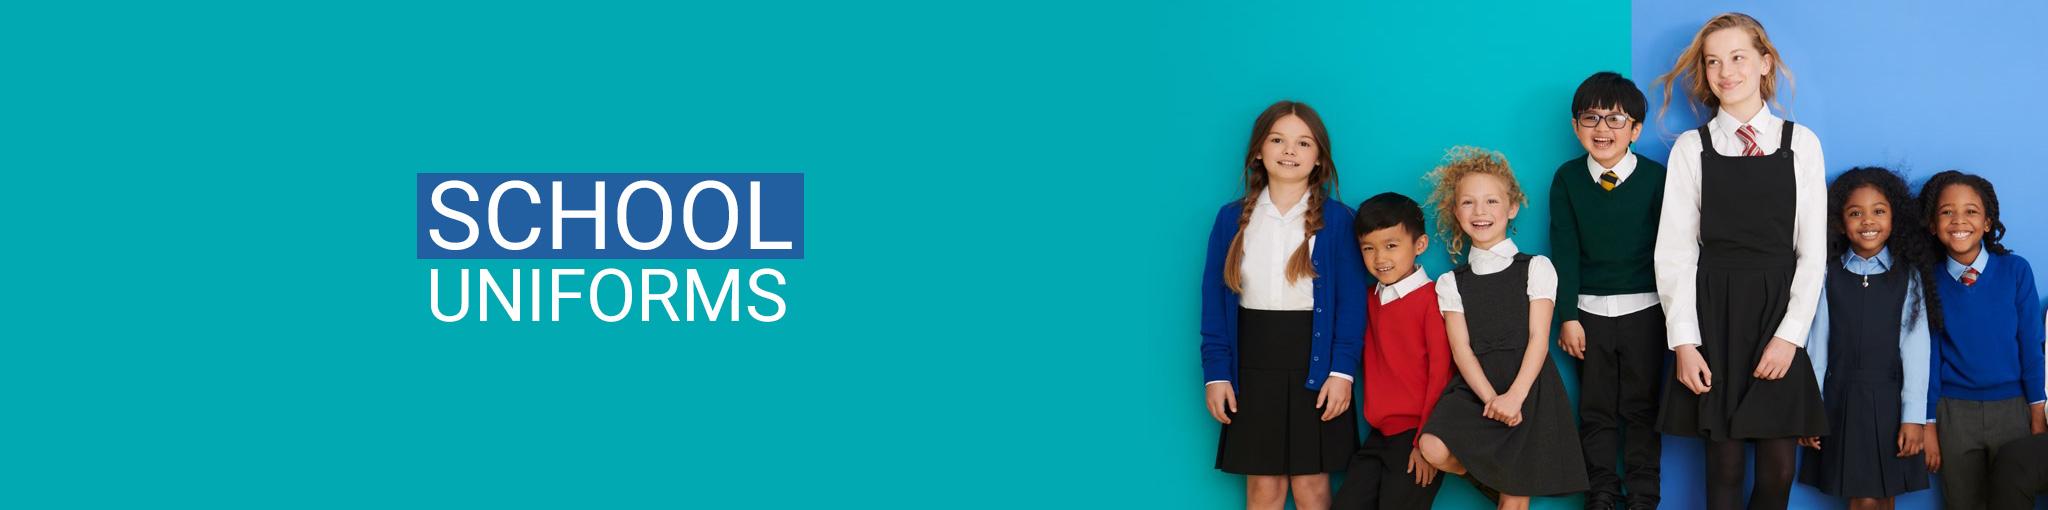 schools uniform apparel